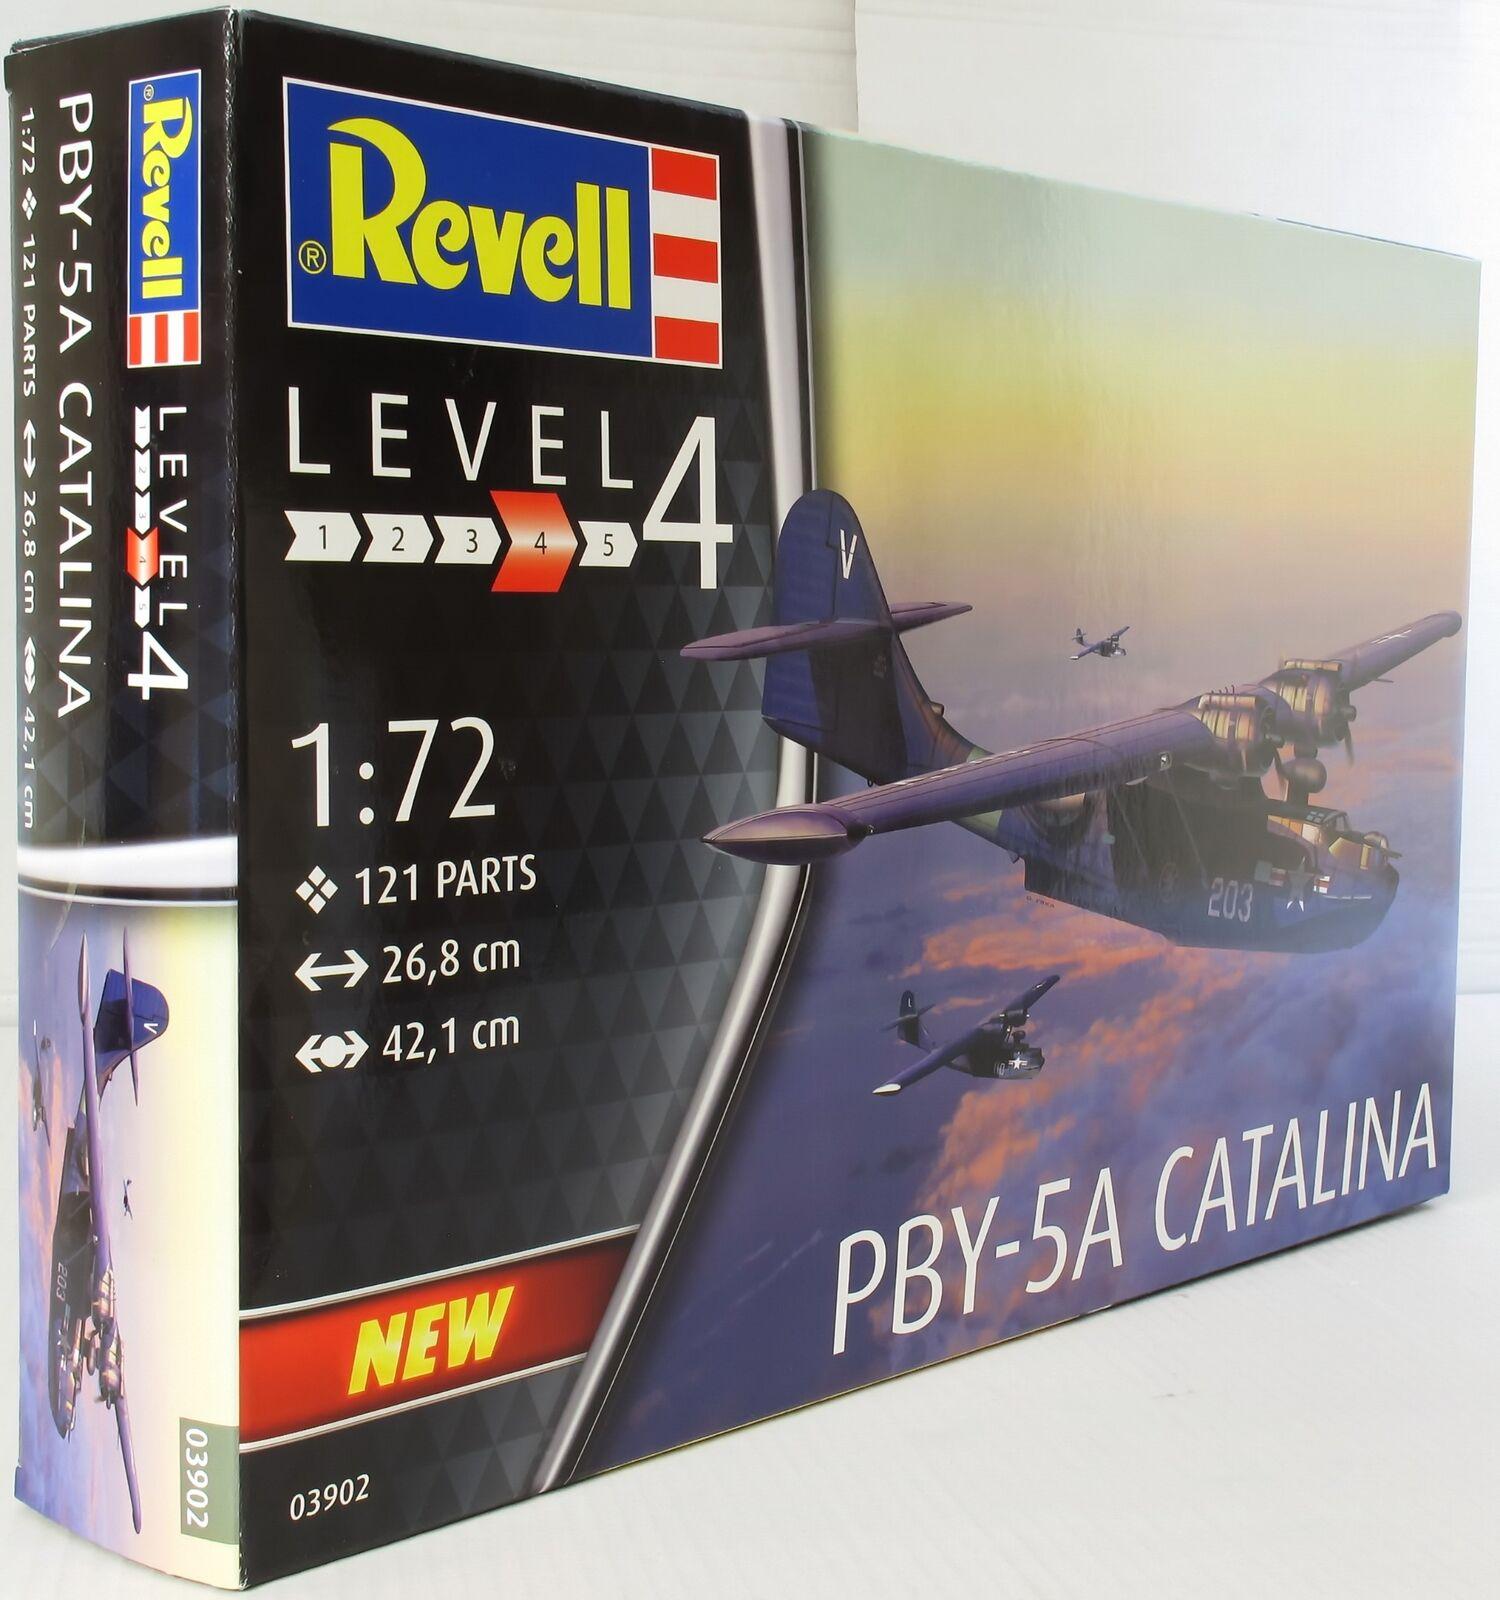 Revell 1 72 03902 PBY-5a Catalina Model Aircraft Kit